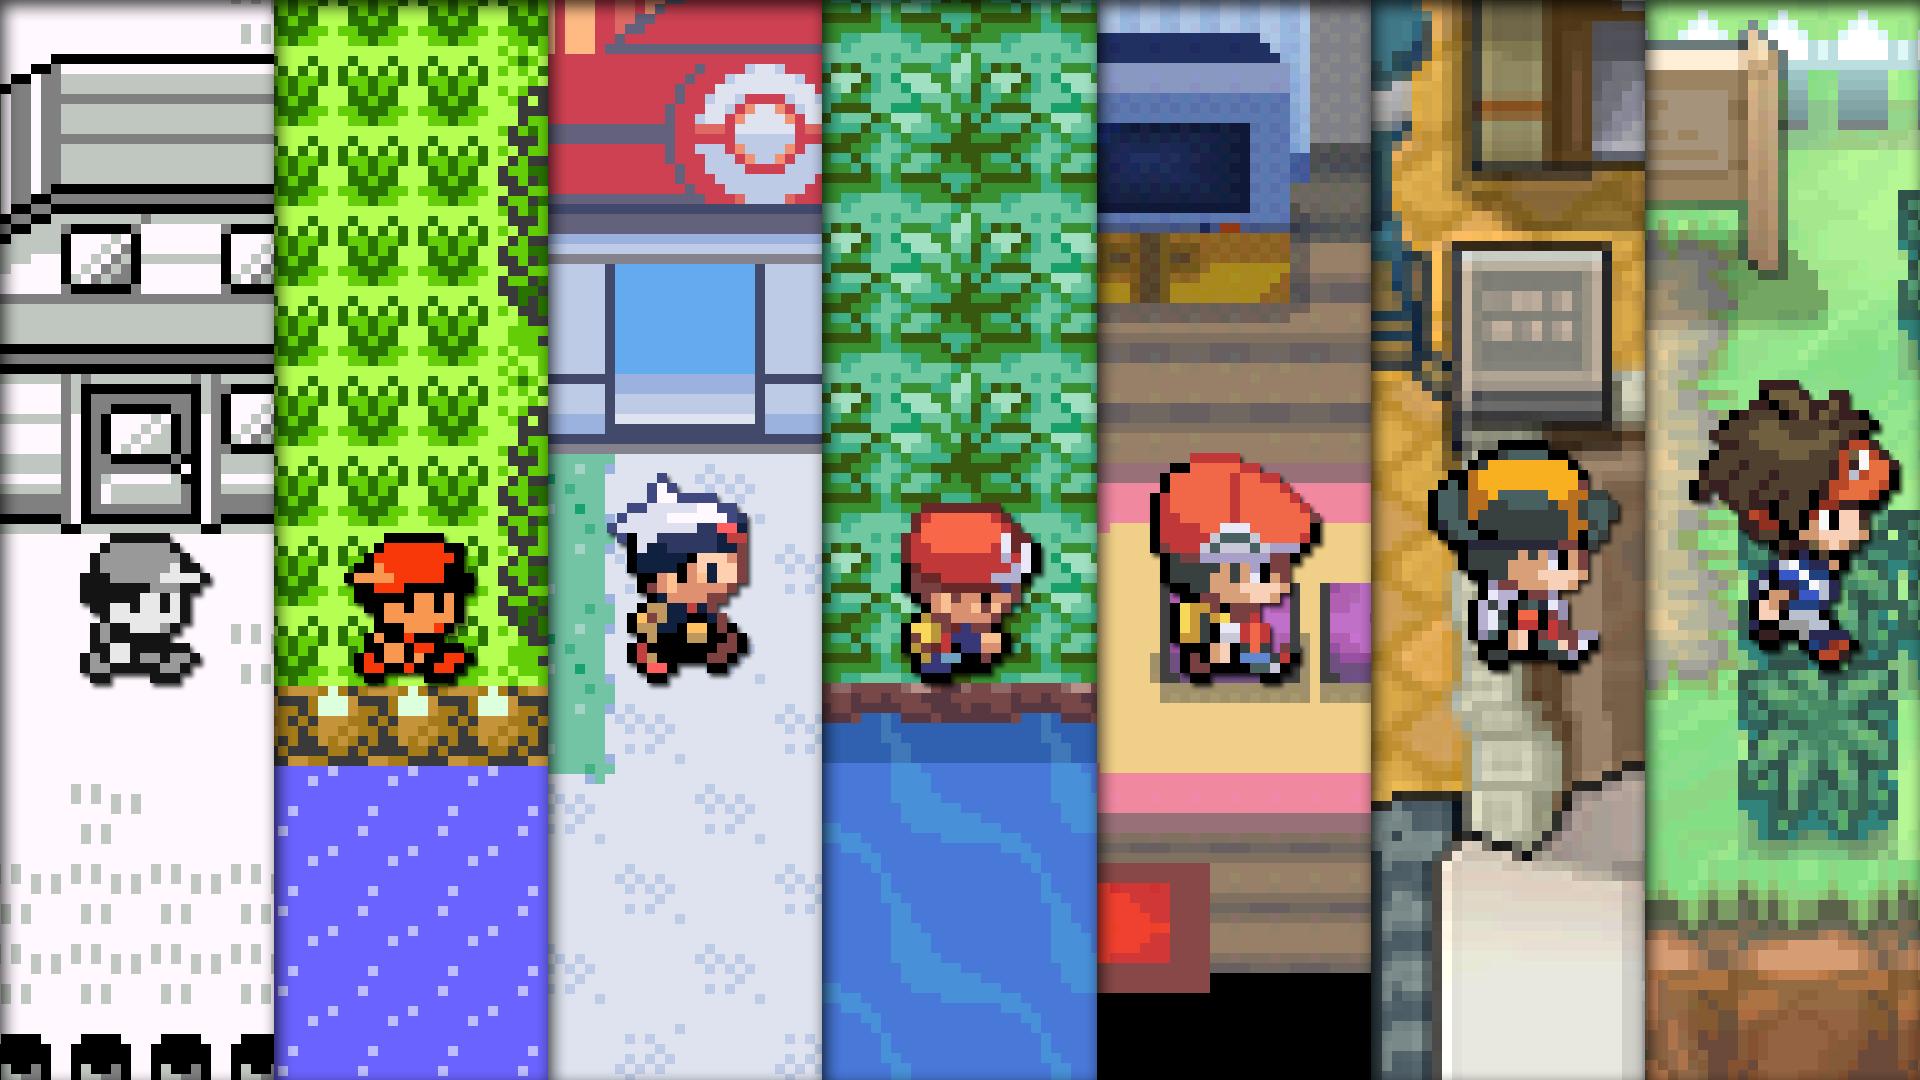 Source: http://orig10.deviantart.net/aa2b/f/2013/116/9/4/evolution_of_pokemon_by_jaime07-d632bp6.png